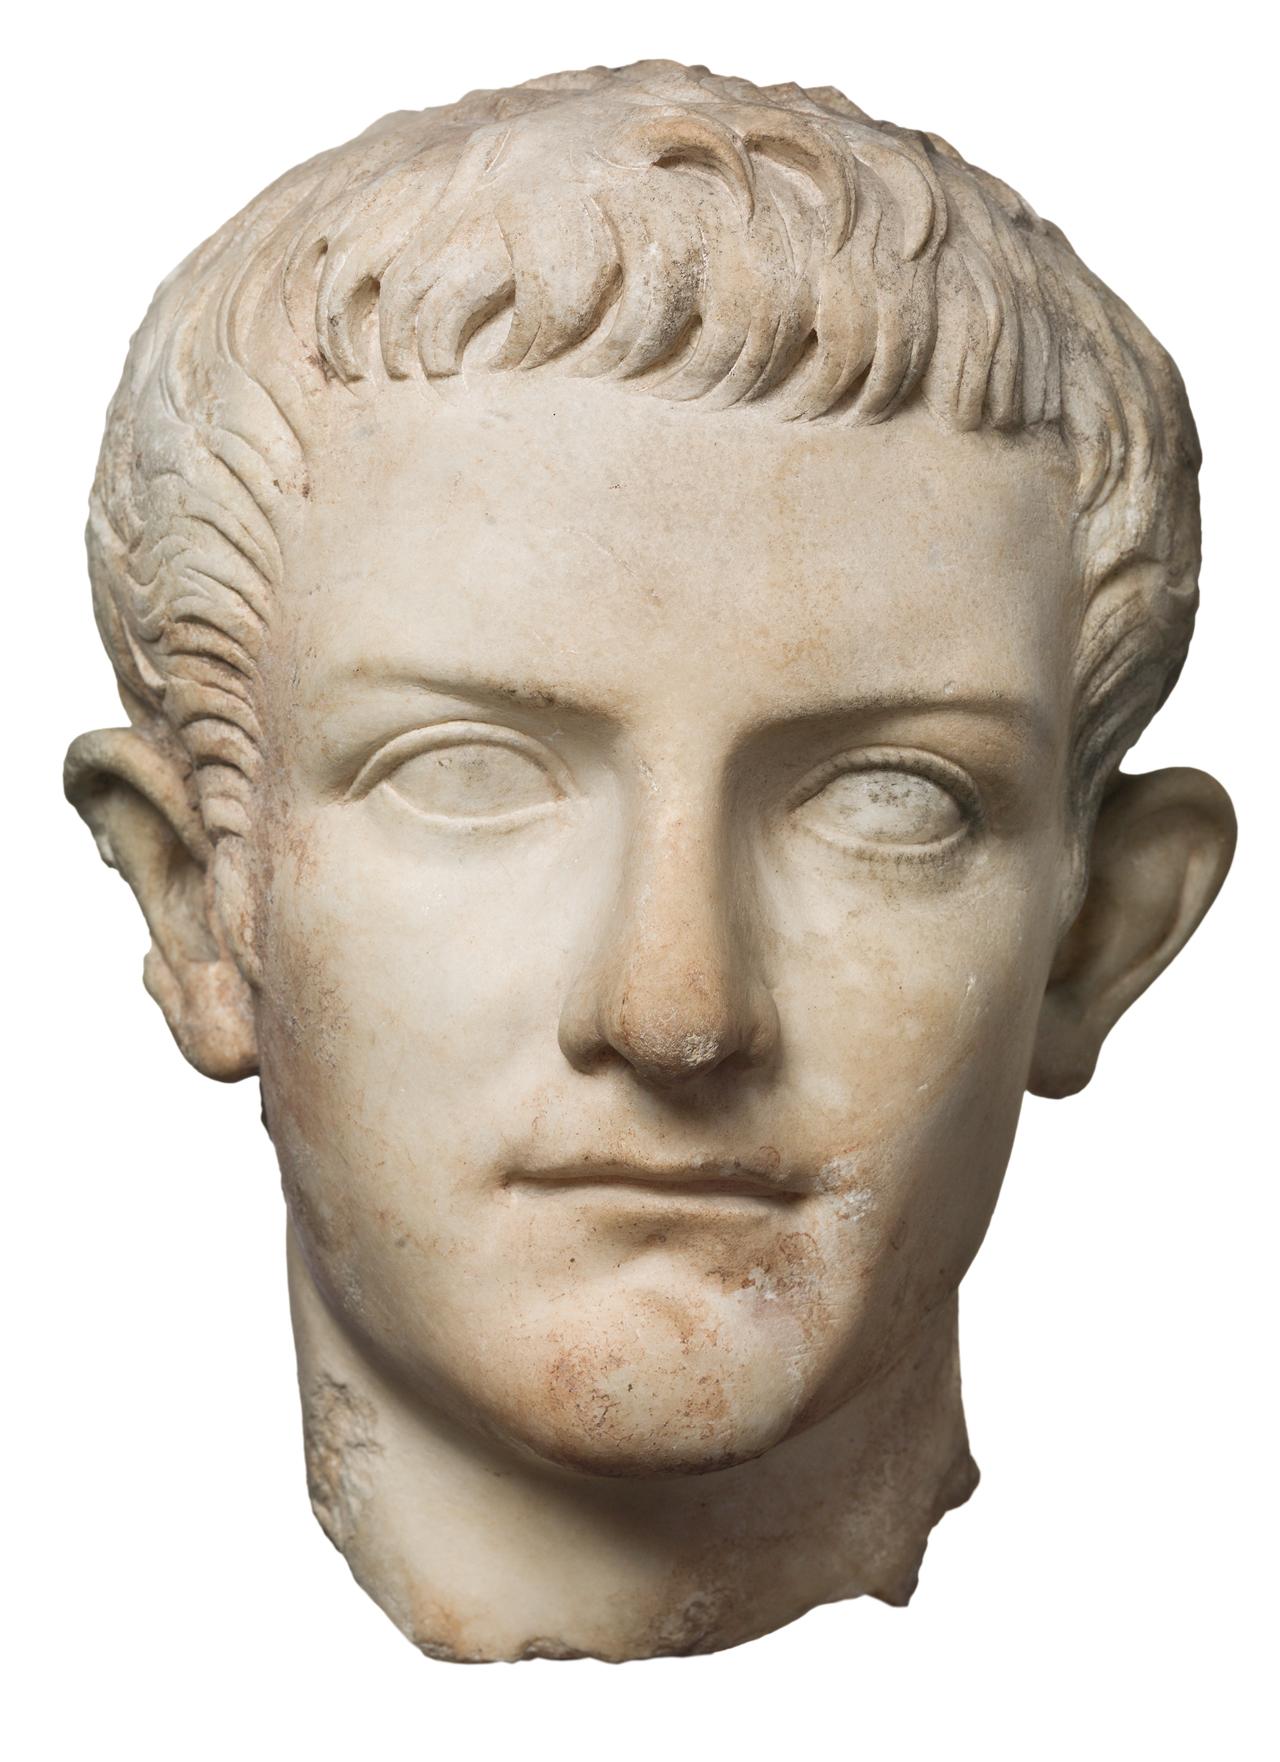 Caligula, (37-41 CE),, marble, h: 28 cm, Ny Carlsberg Glyptotek